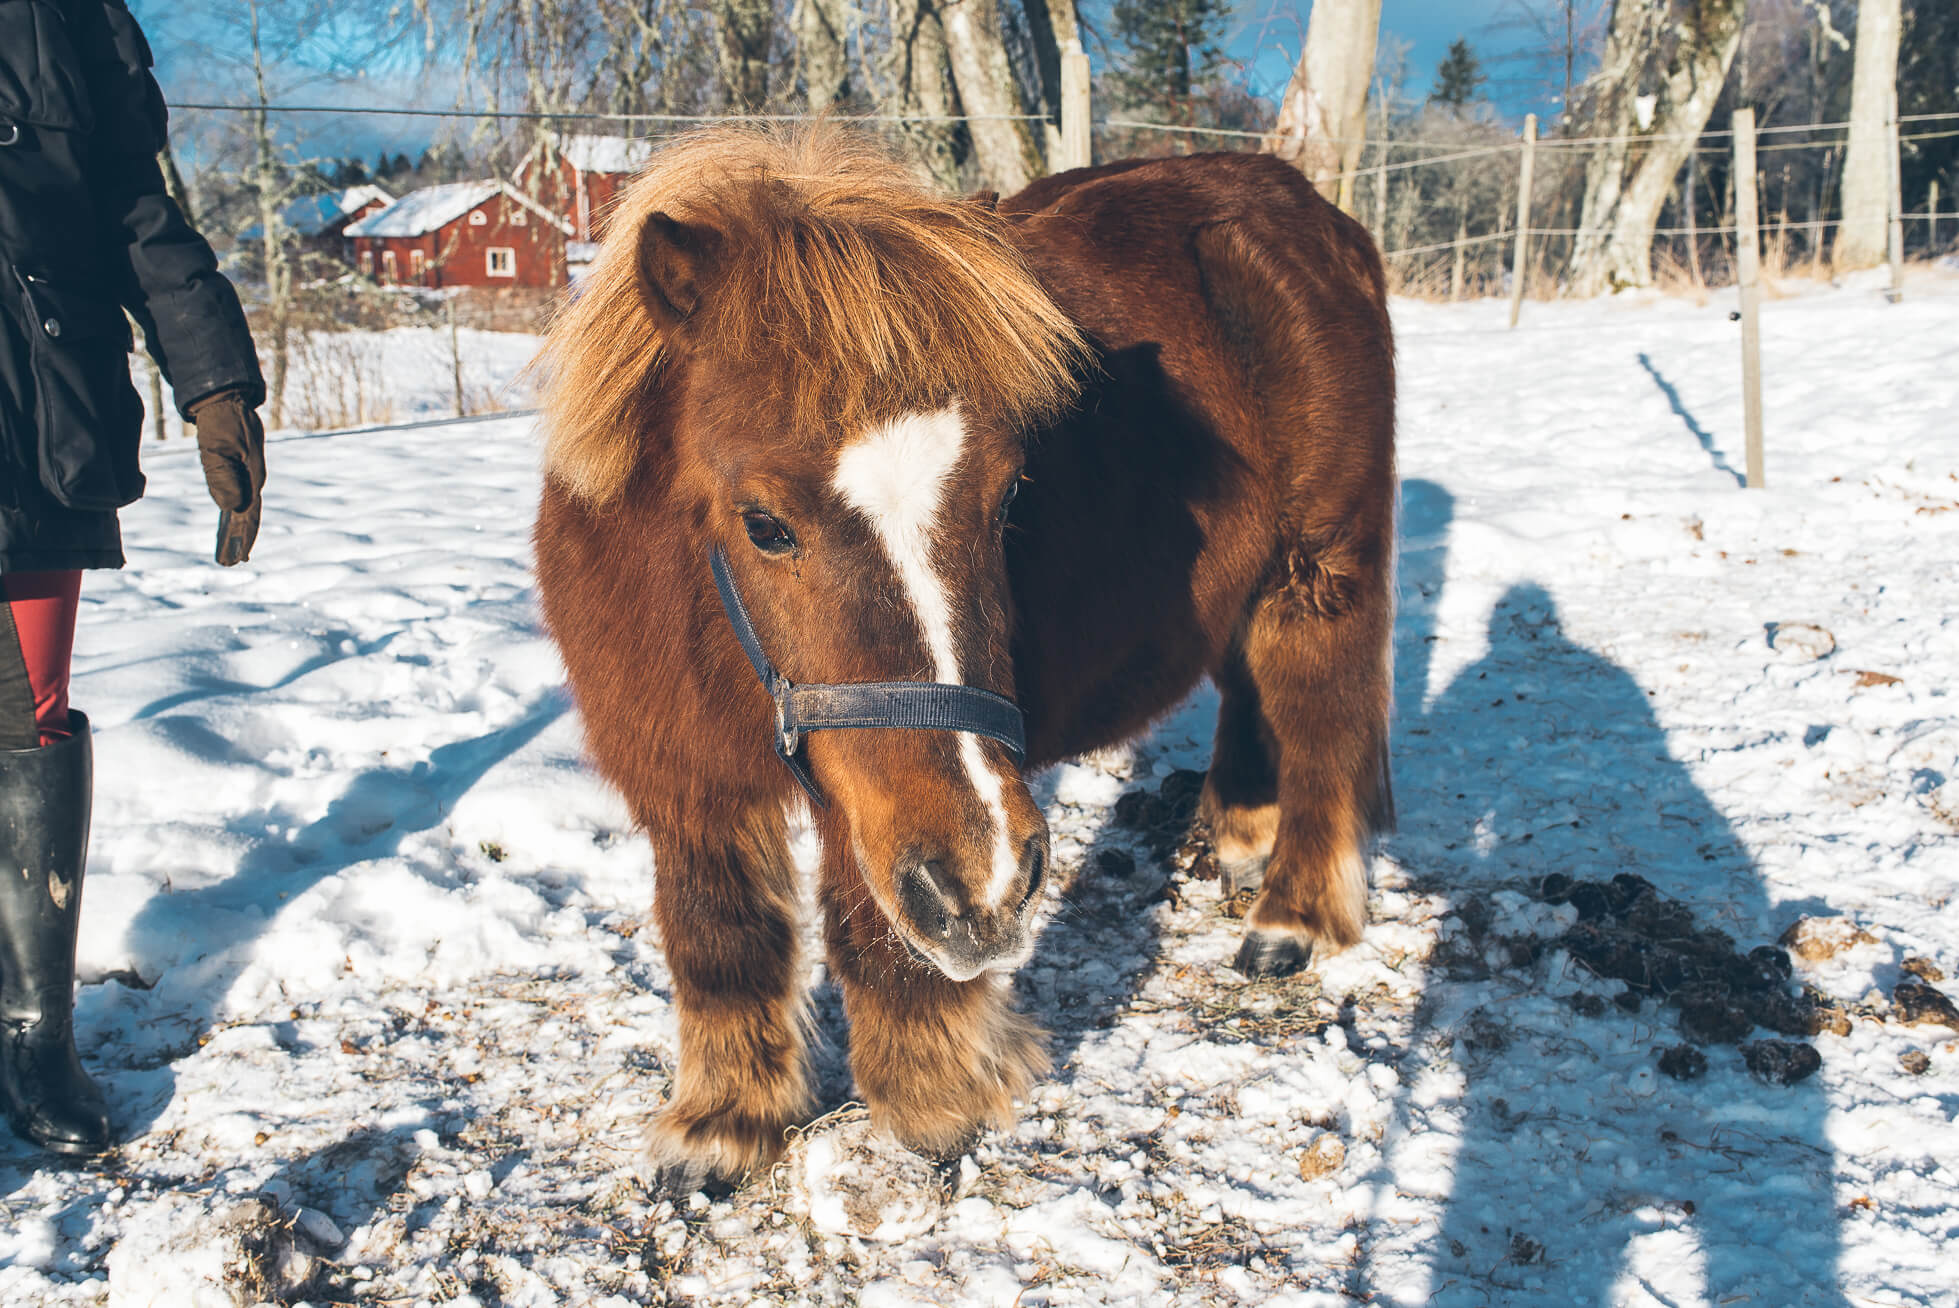 janni-deler-horses-snowDSC_6495